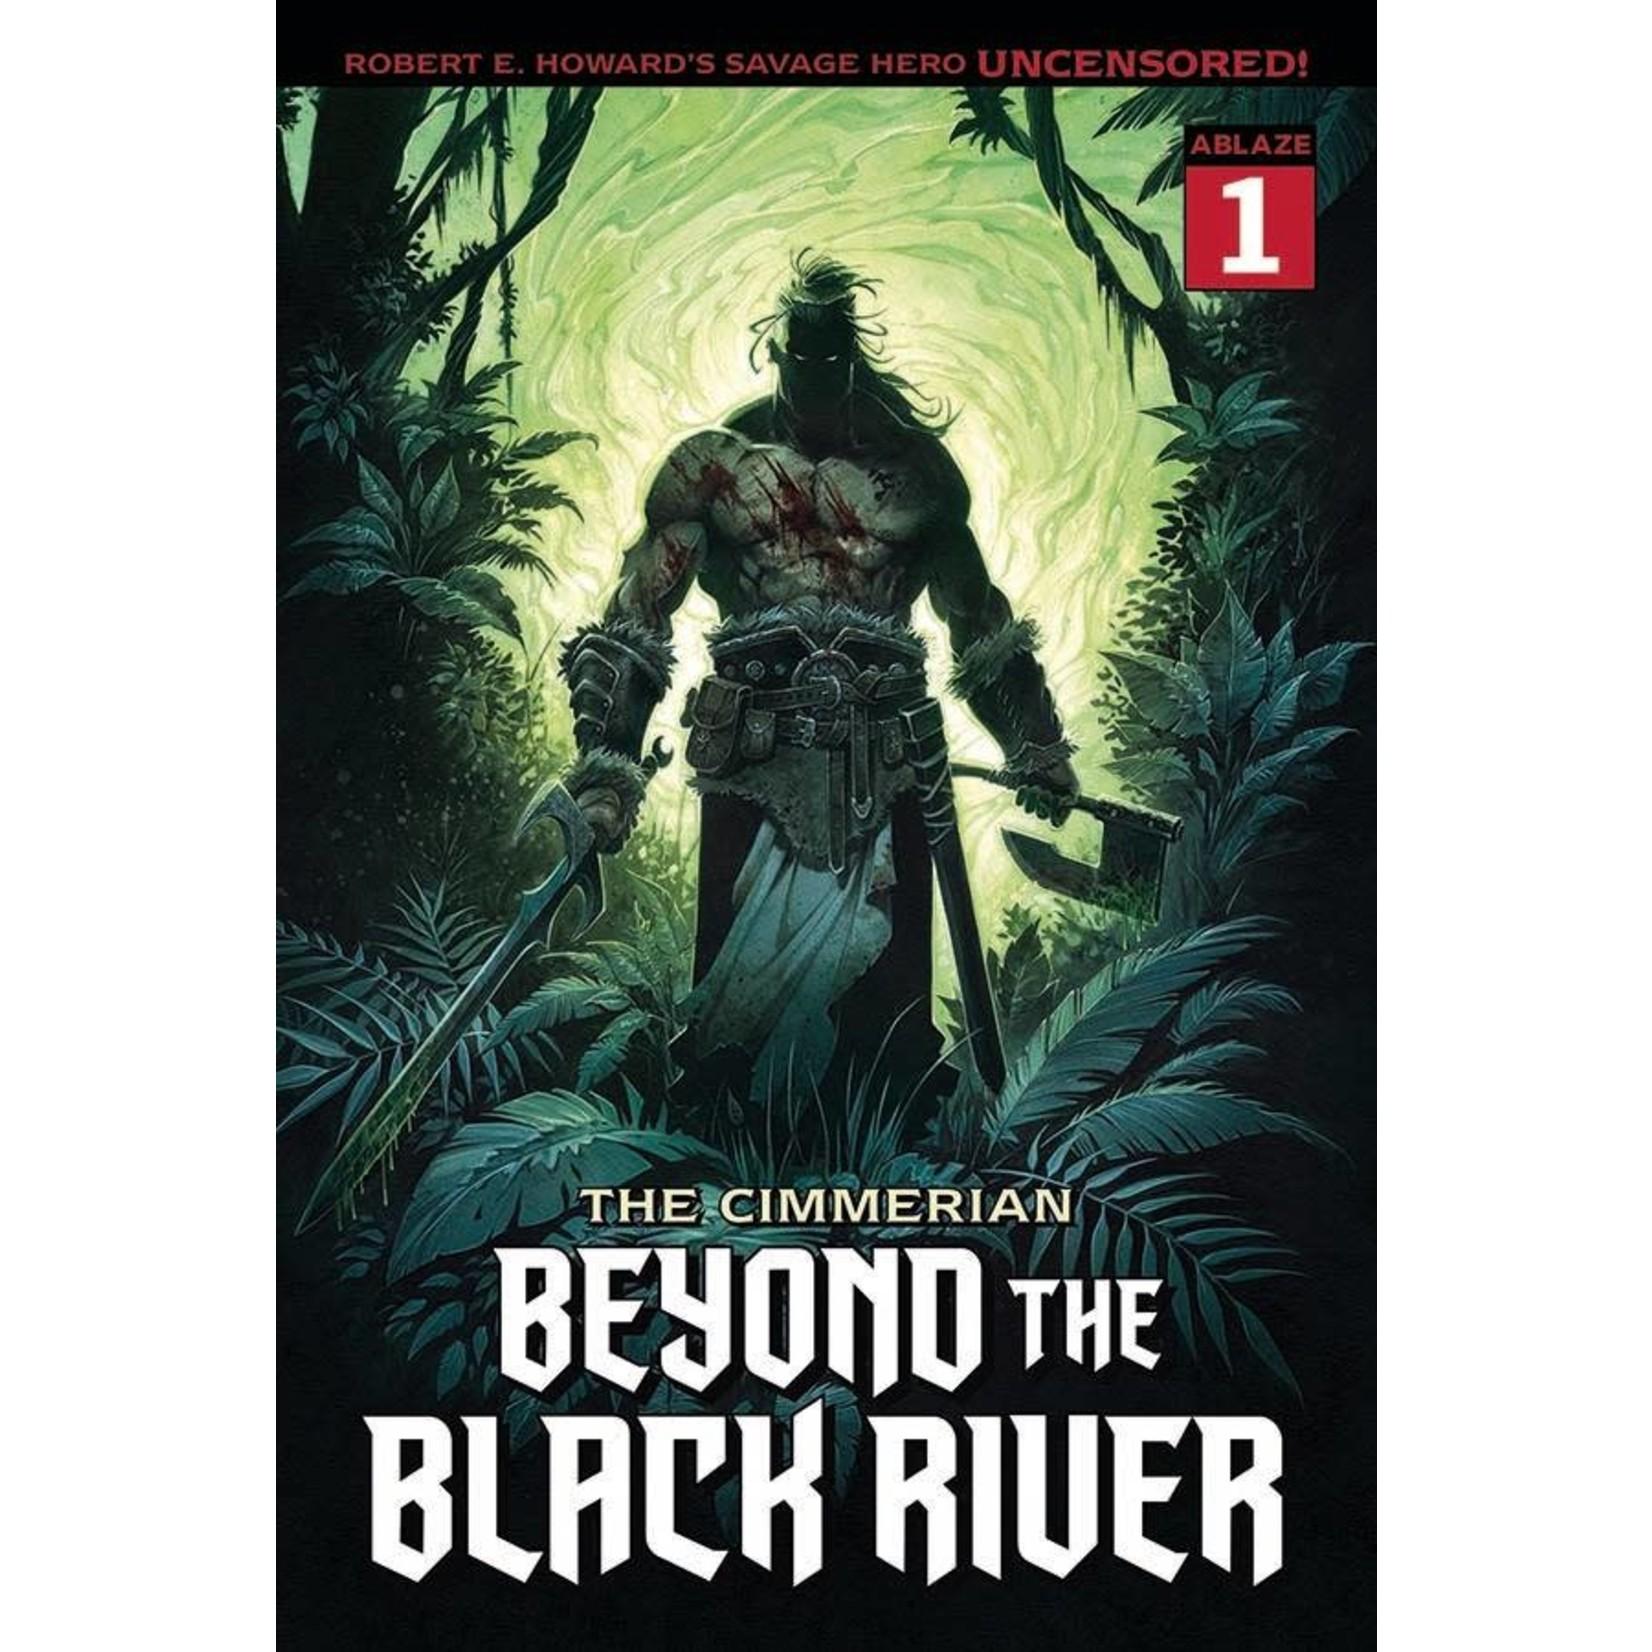 Ablaze The Cimmerian: Beyond the Black River #1 Cover B Jean